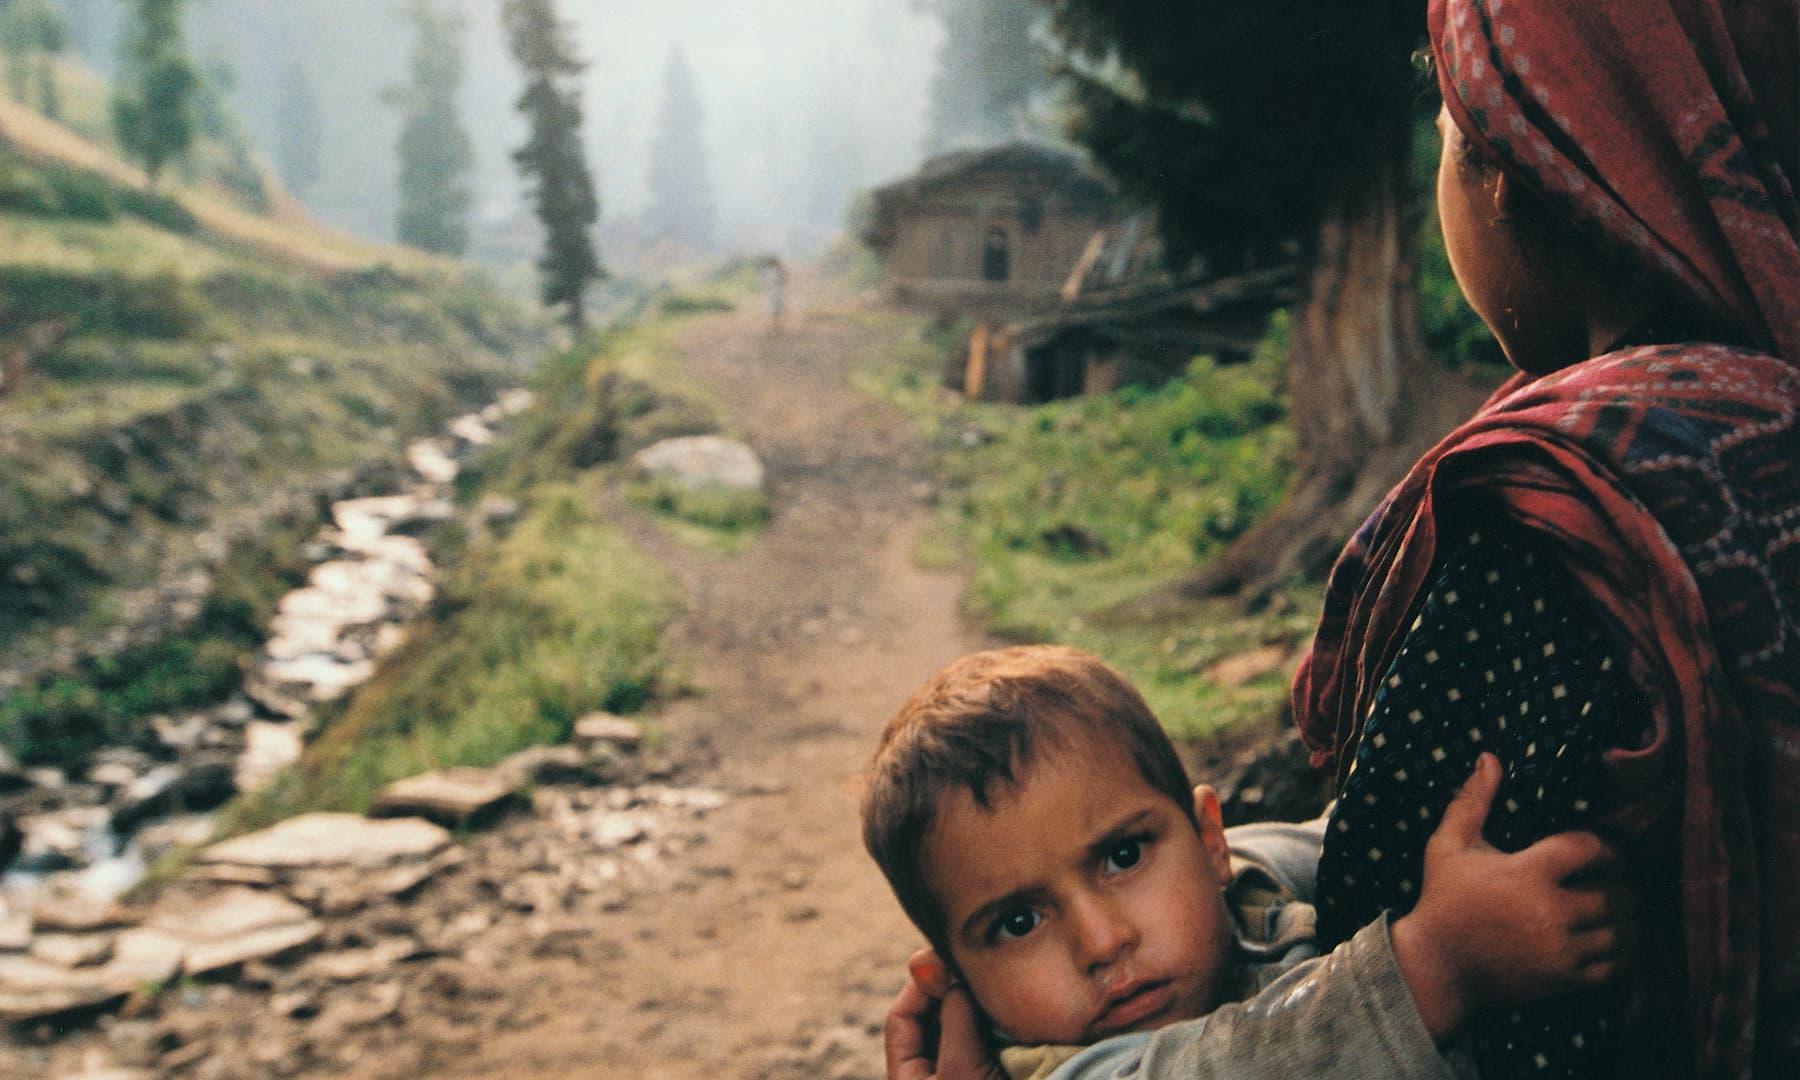 Scenes from the village life of Taobat | Arif Mahmood, White Star